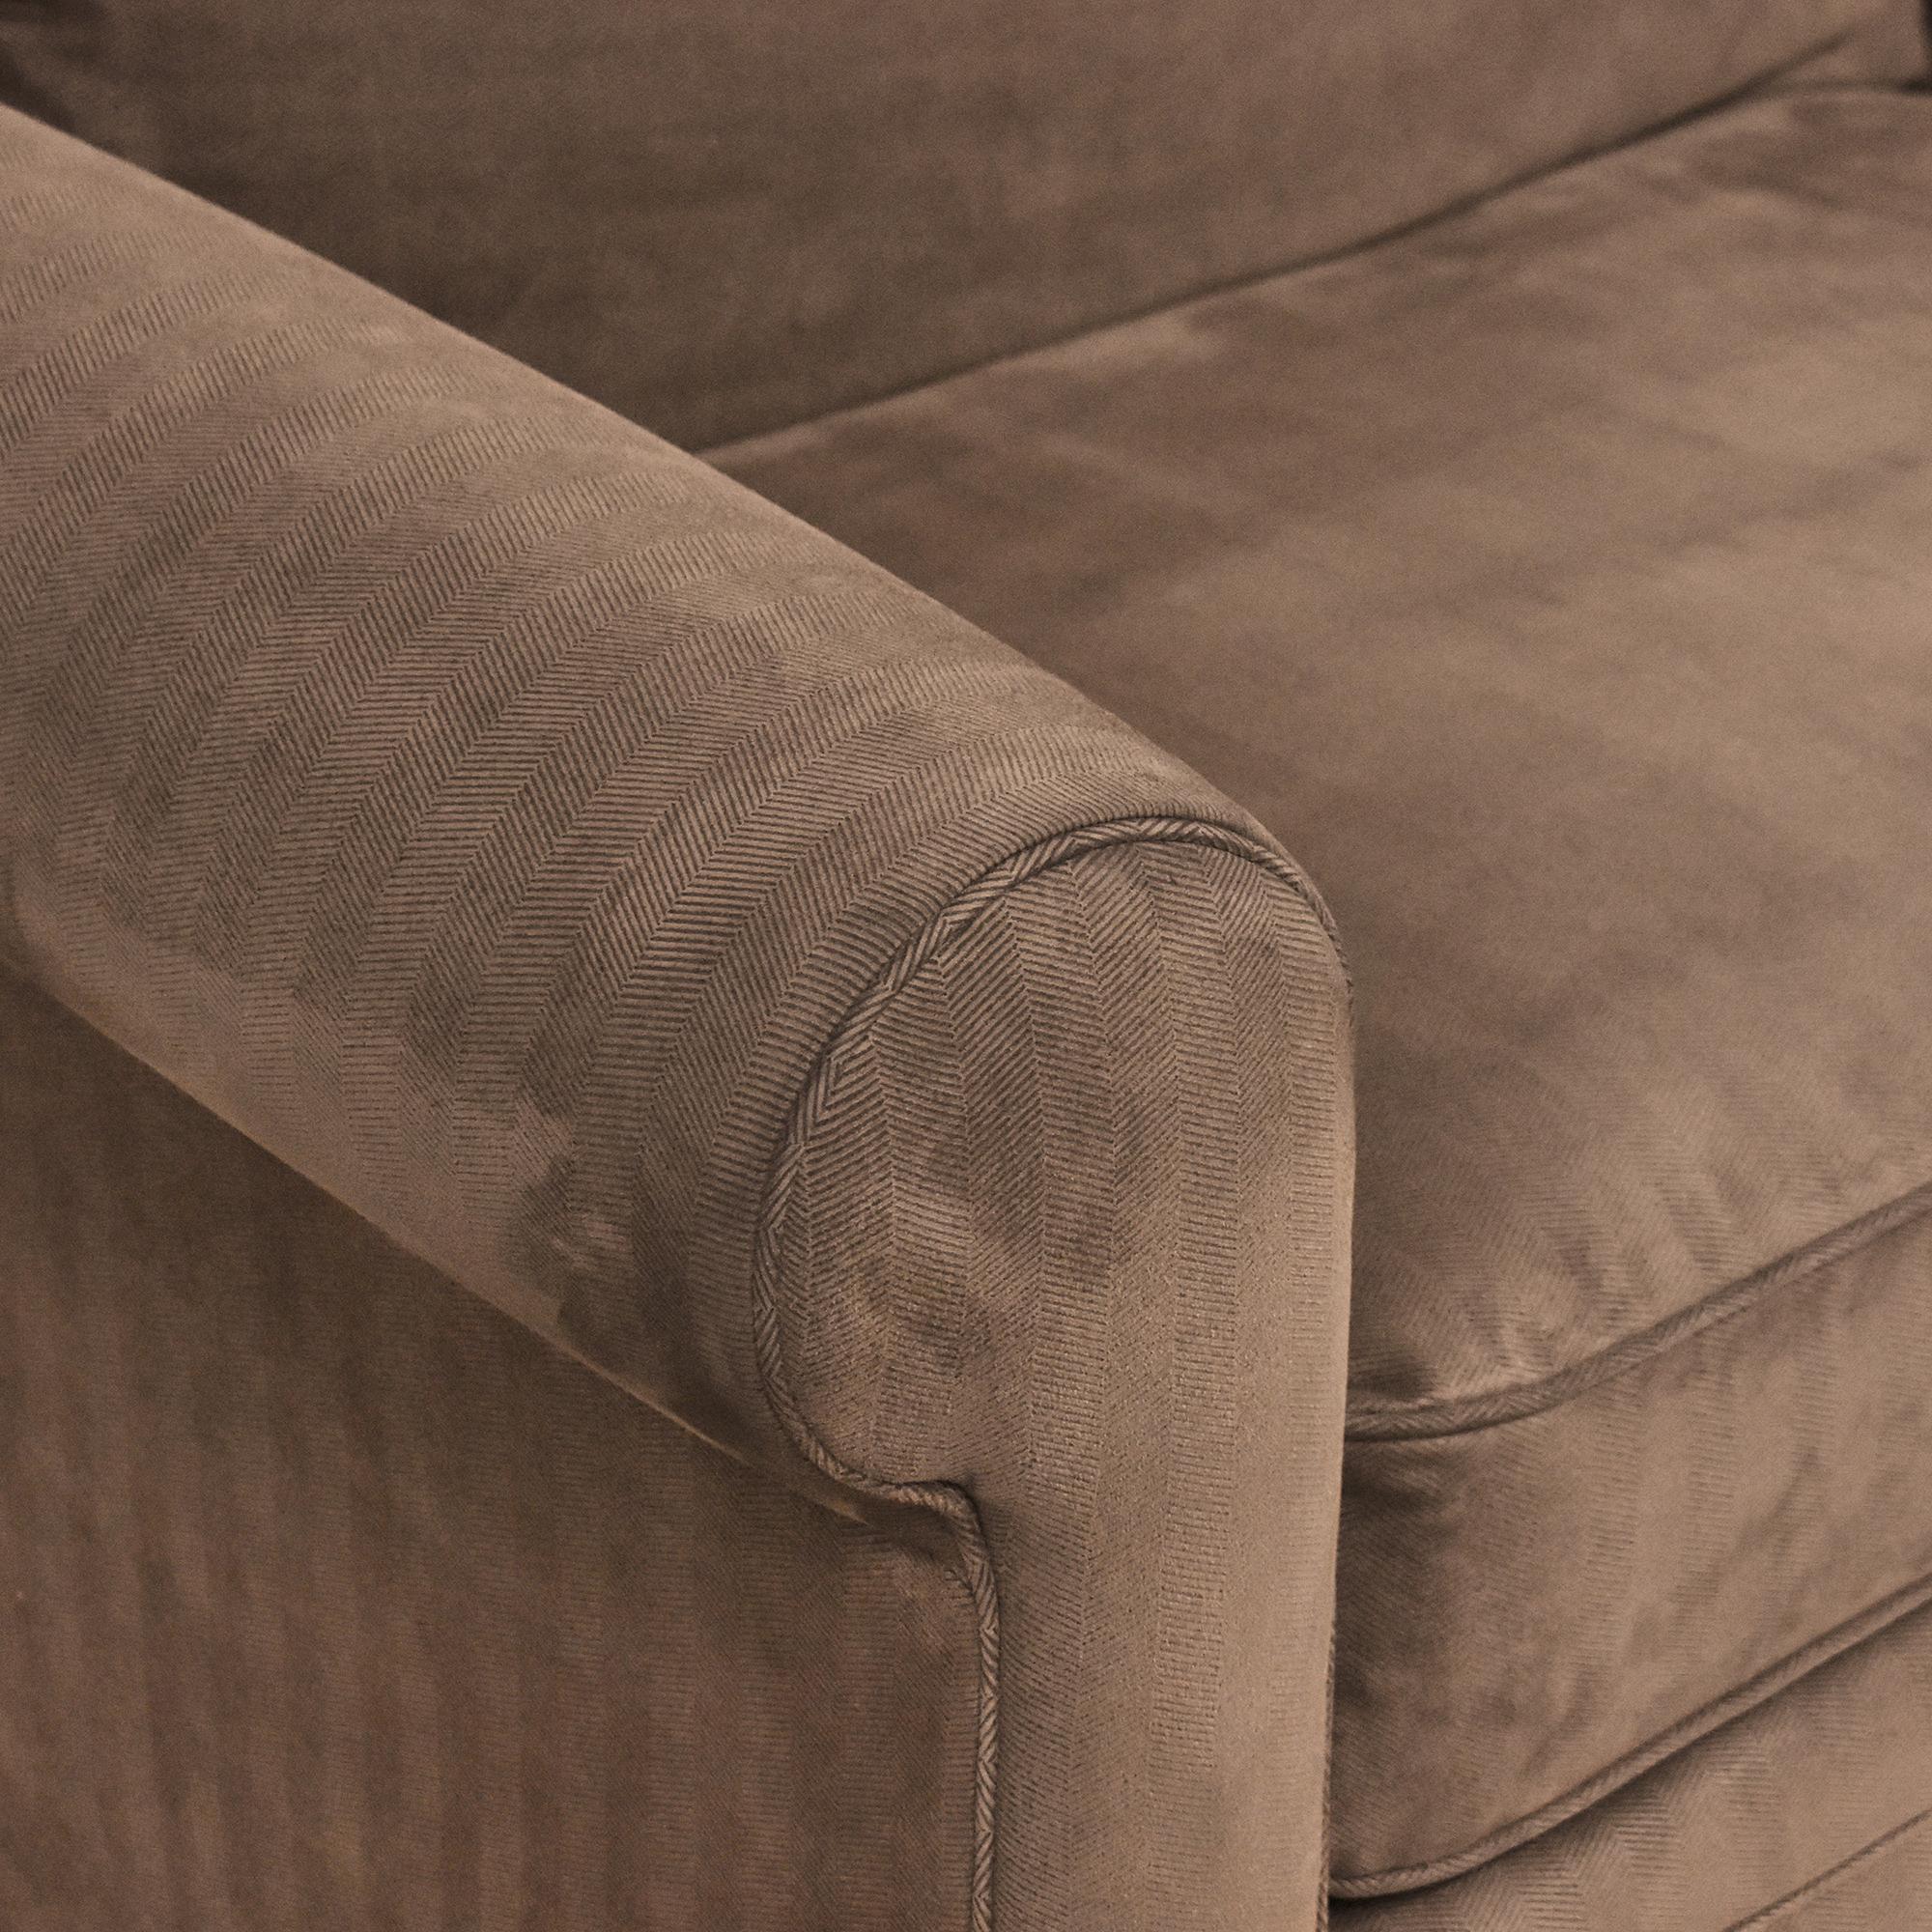 Macy's Macy's Modern Concepts Two Cushion Sofa brown